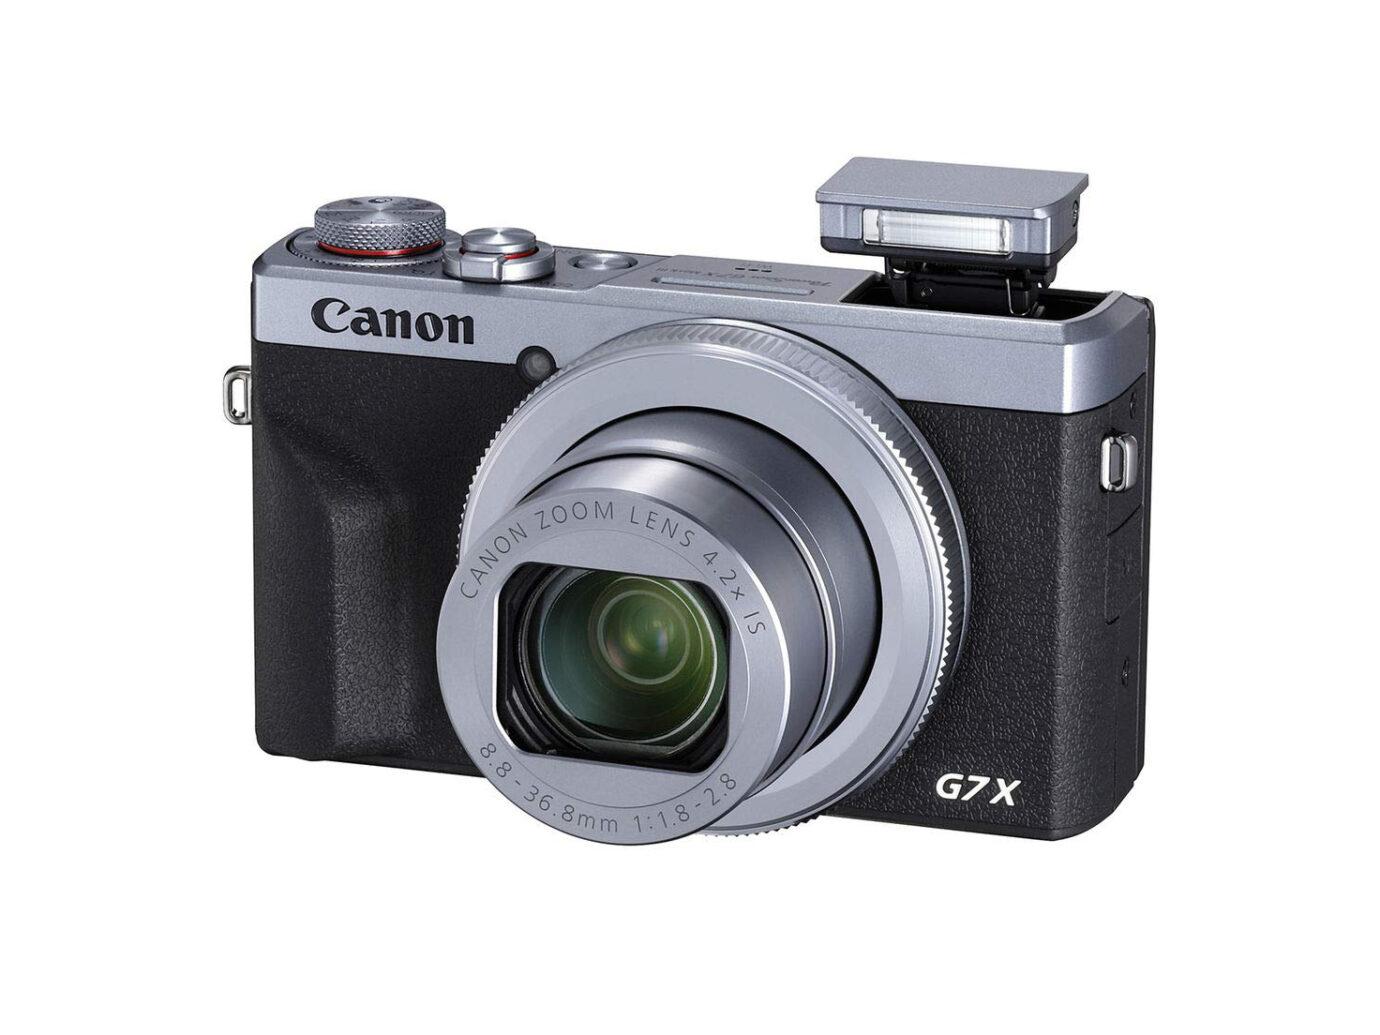 Canon PowerShot G7 X Mark III Digital Camera